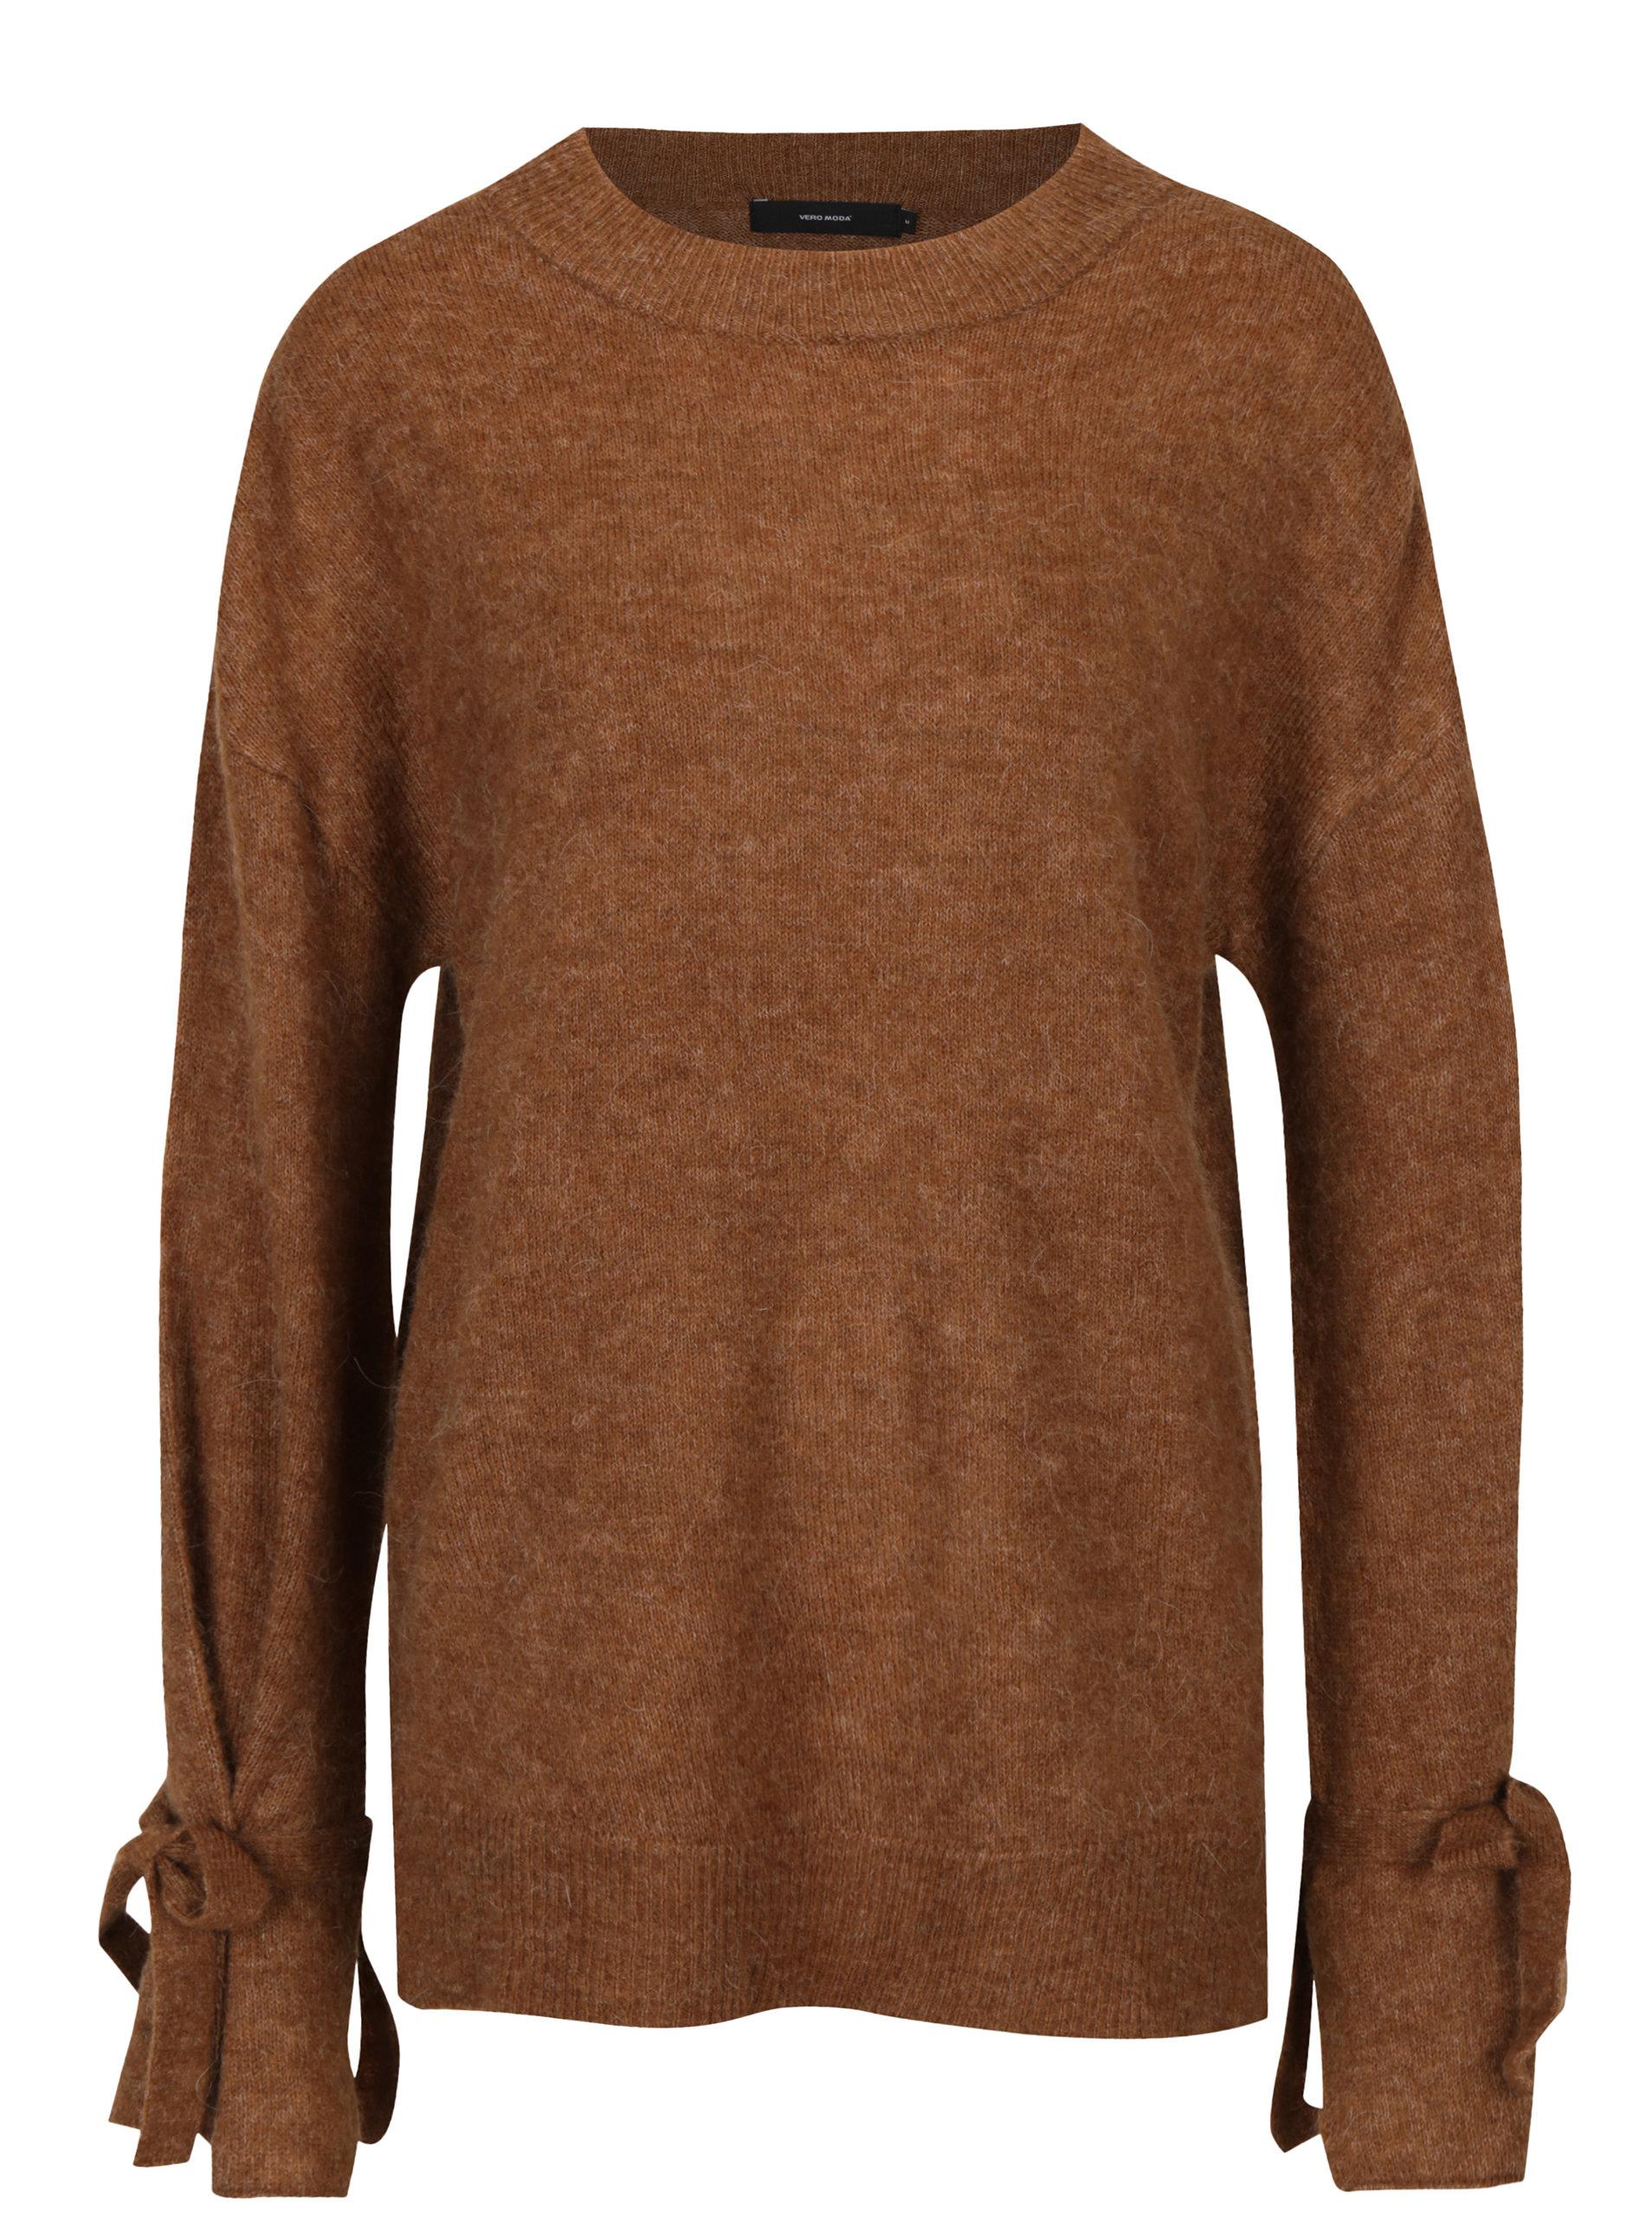 c76adee19f95 Hnedý sveter s mašľami VERO MODA Cersei ...